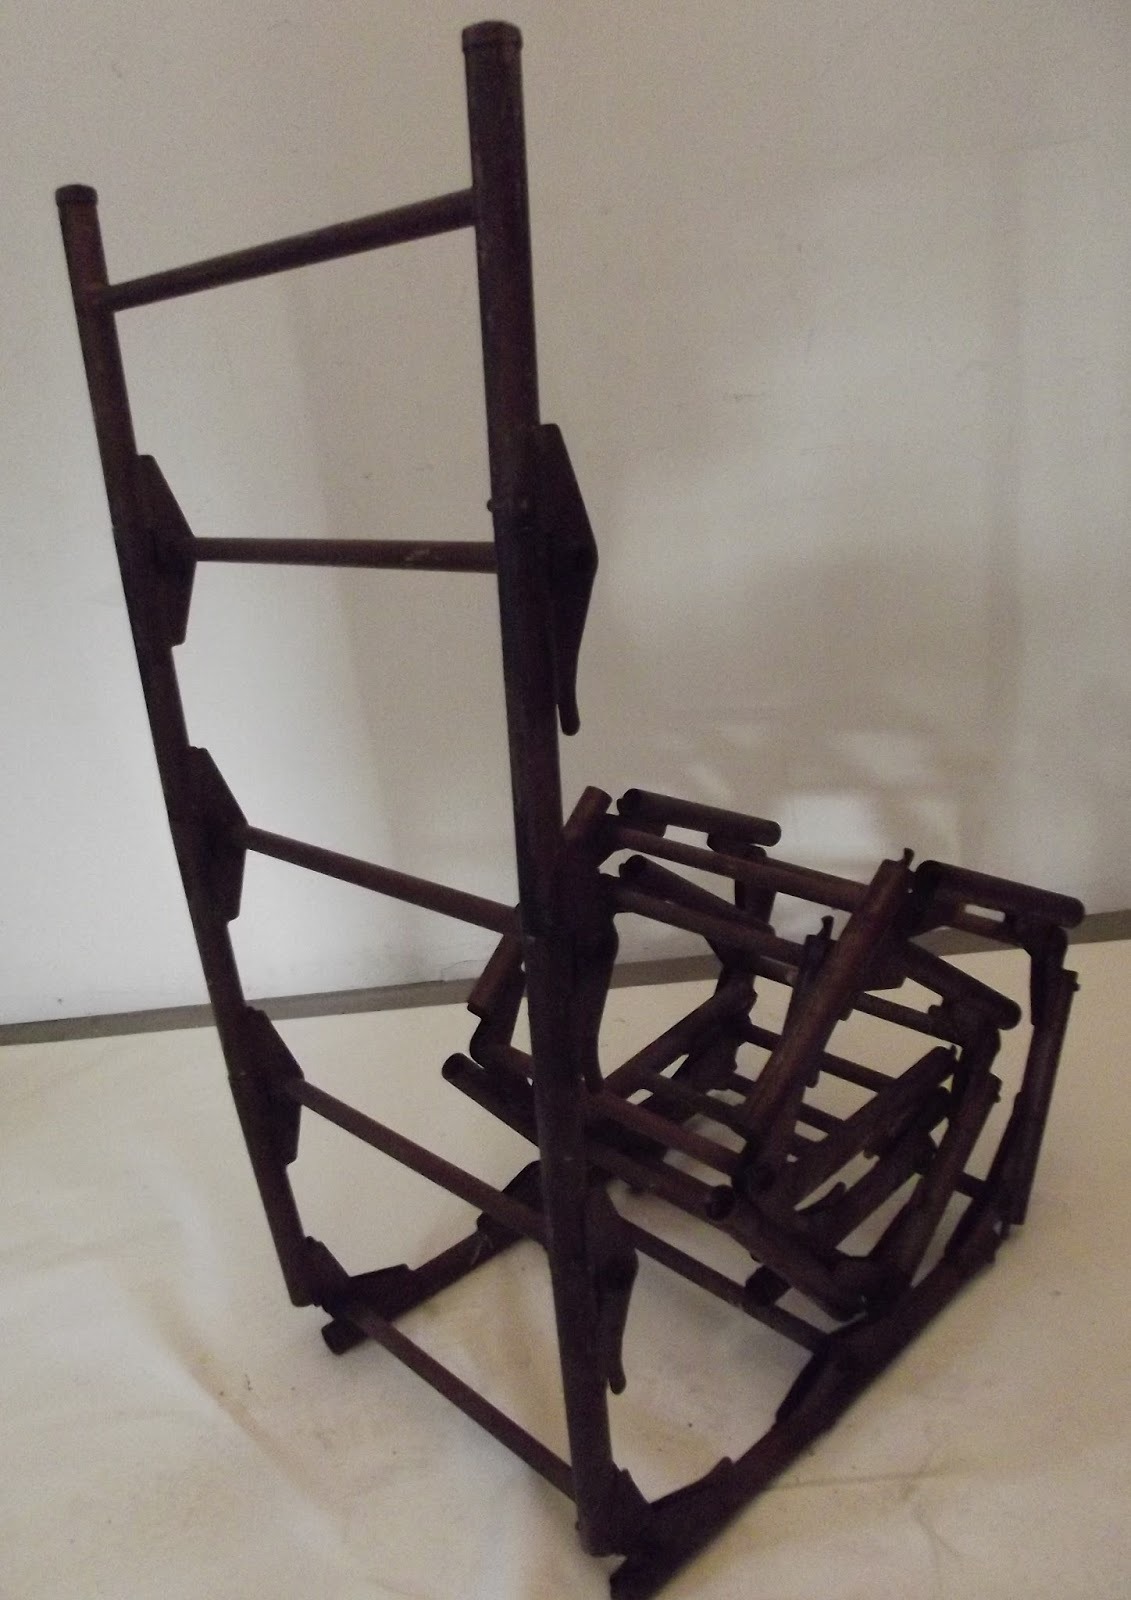 ancienne chelle m tal pliante. Black Bedroom Furniture Sets. Home Design Ideas